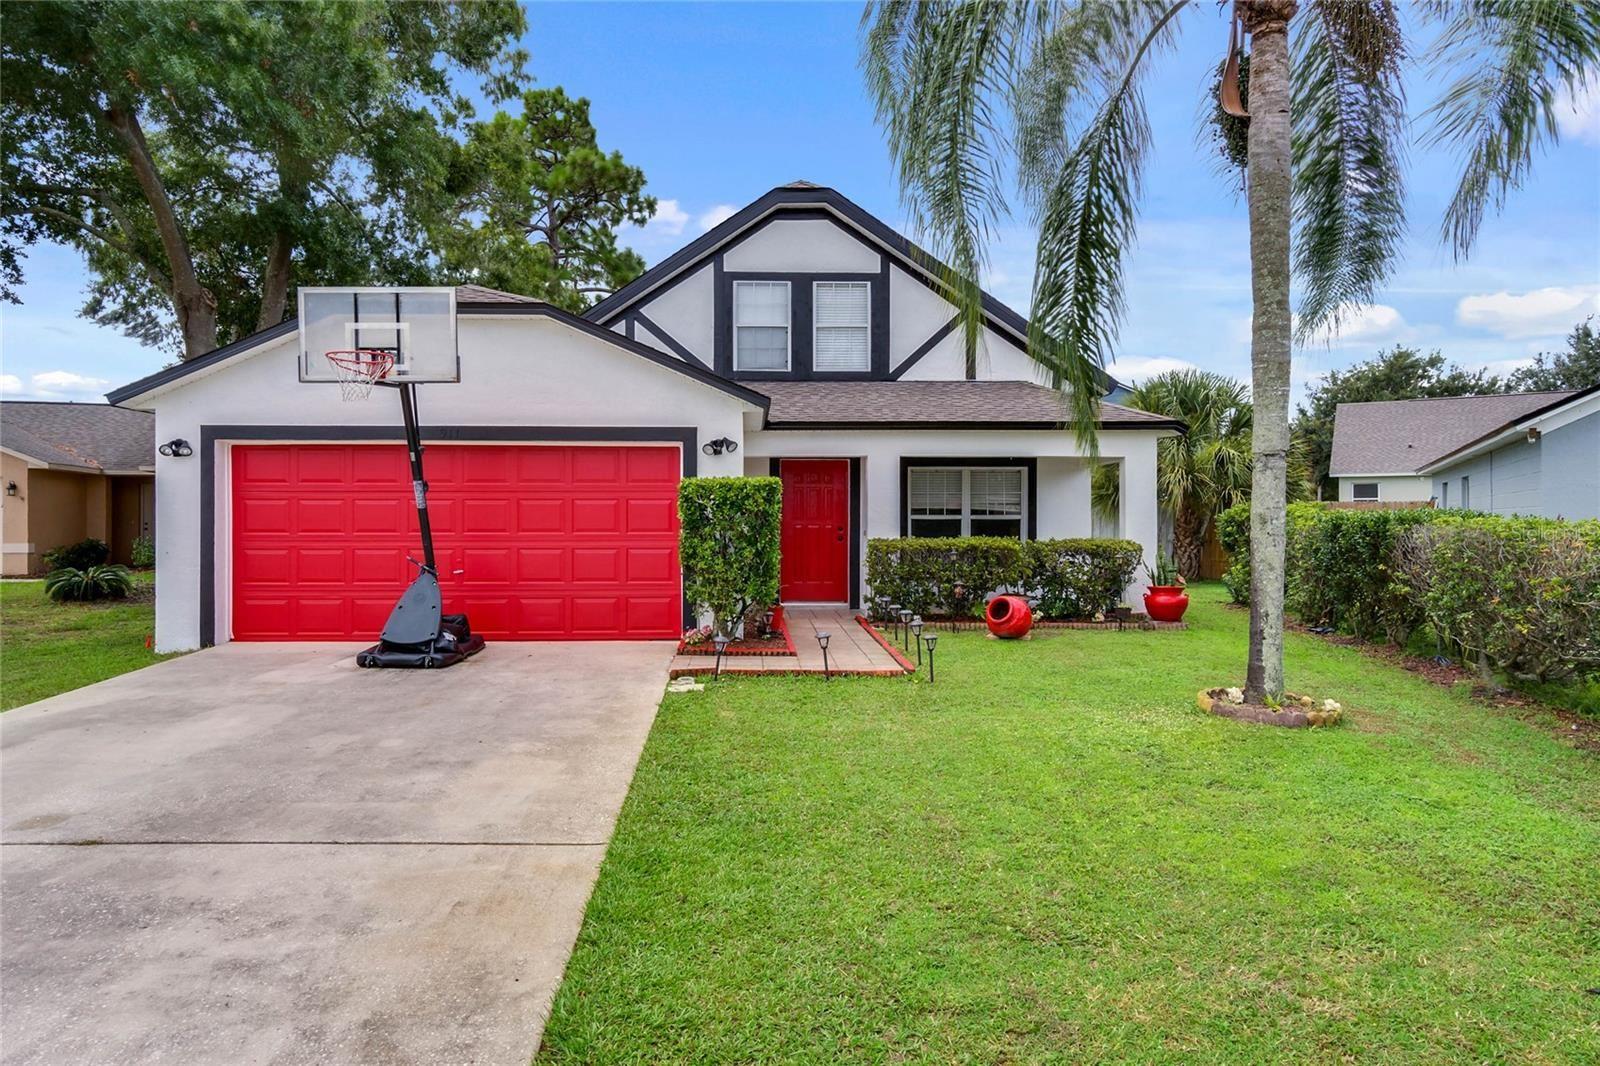 911 LEJAY STREET, Orlando, FL 32825 - #: S5054525